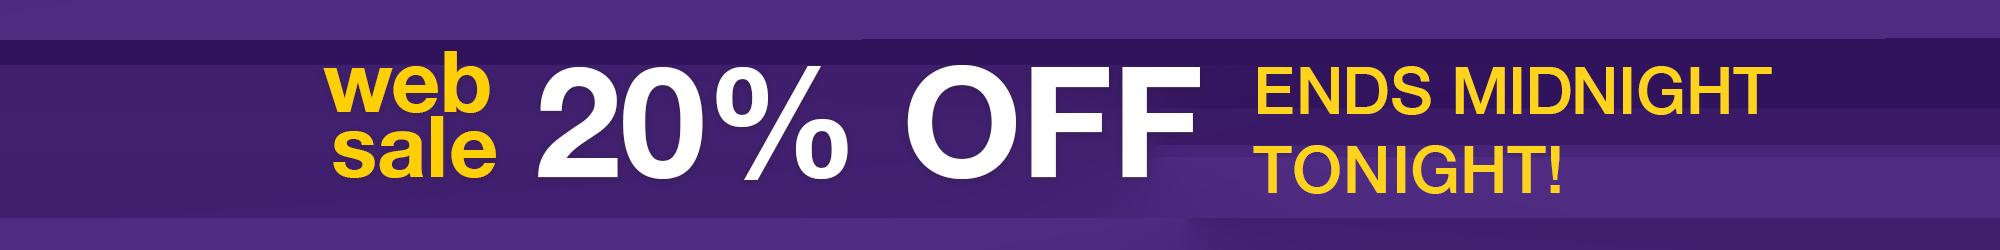 20% Web Sale Ends Tonight